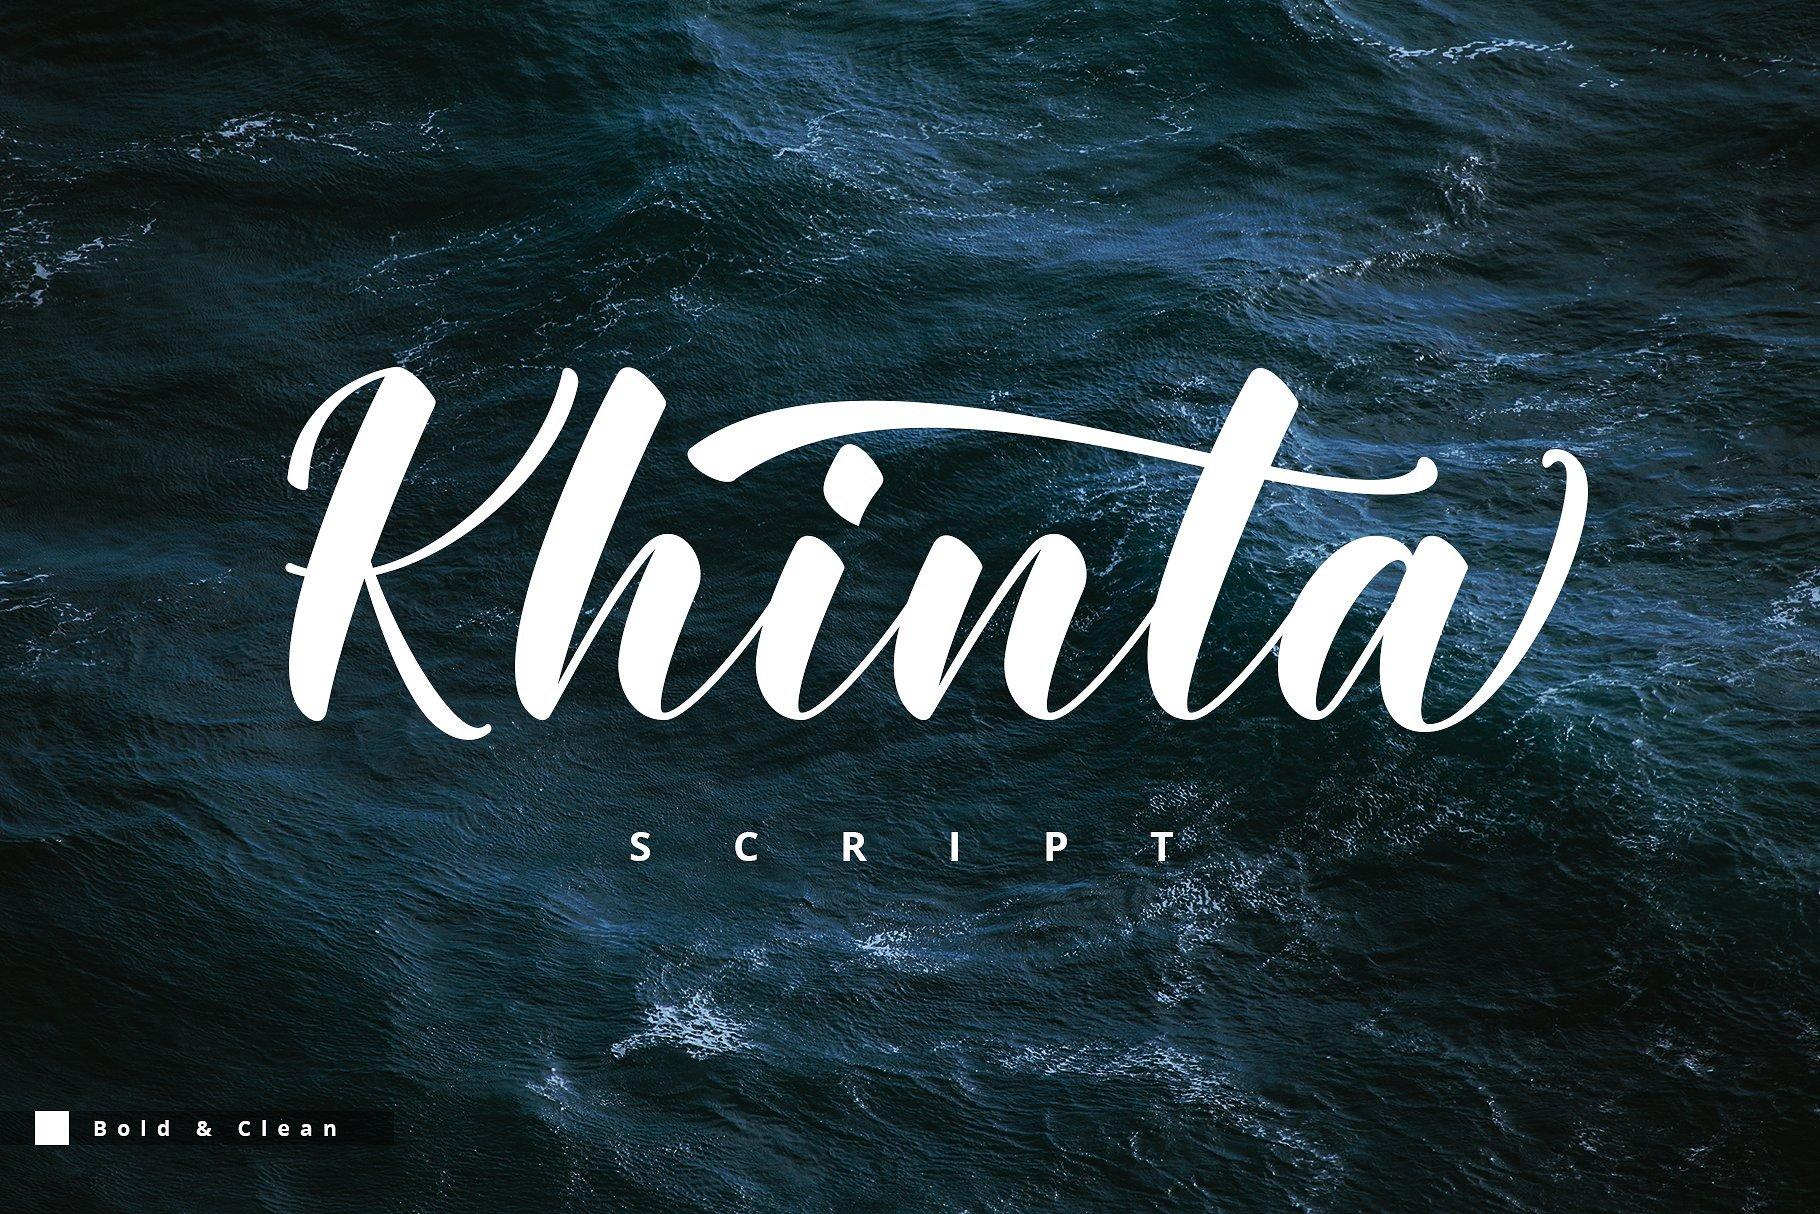 https://fontclarity.com/wp-content/uploads/2019/09/khinta-script-font-download-0.jpg Free Download